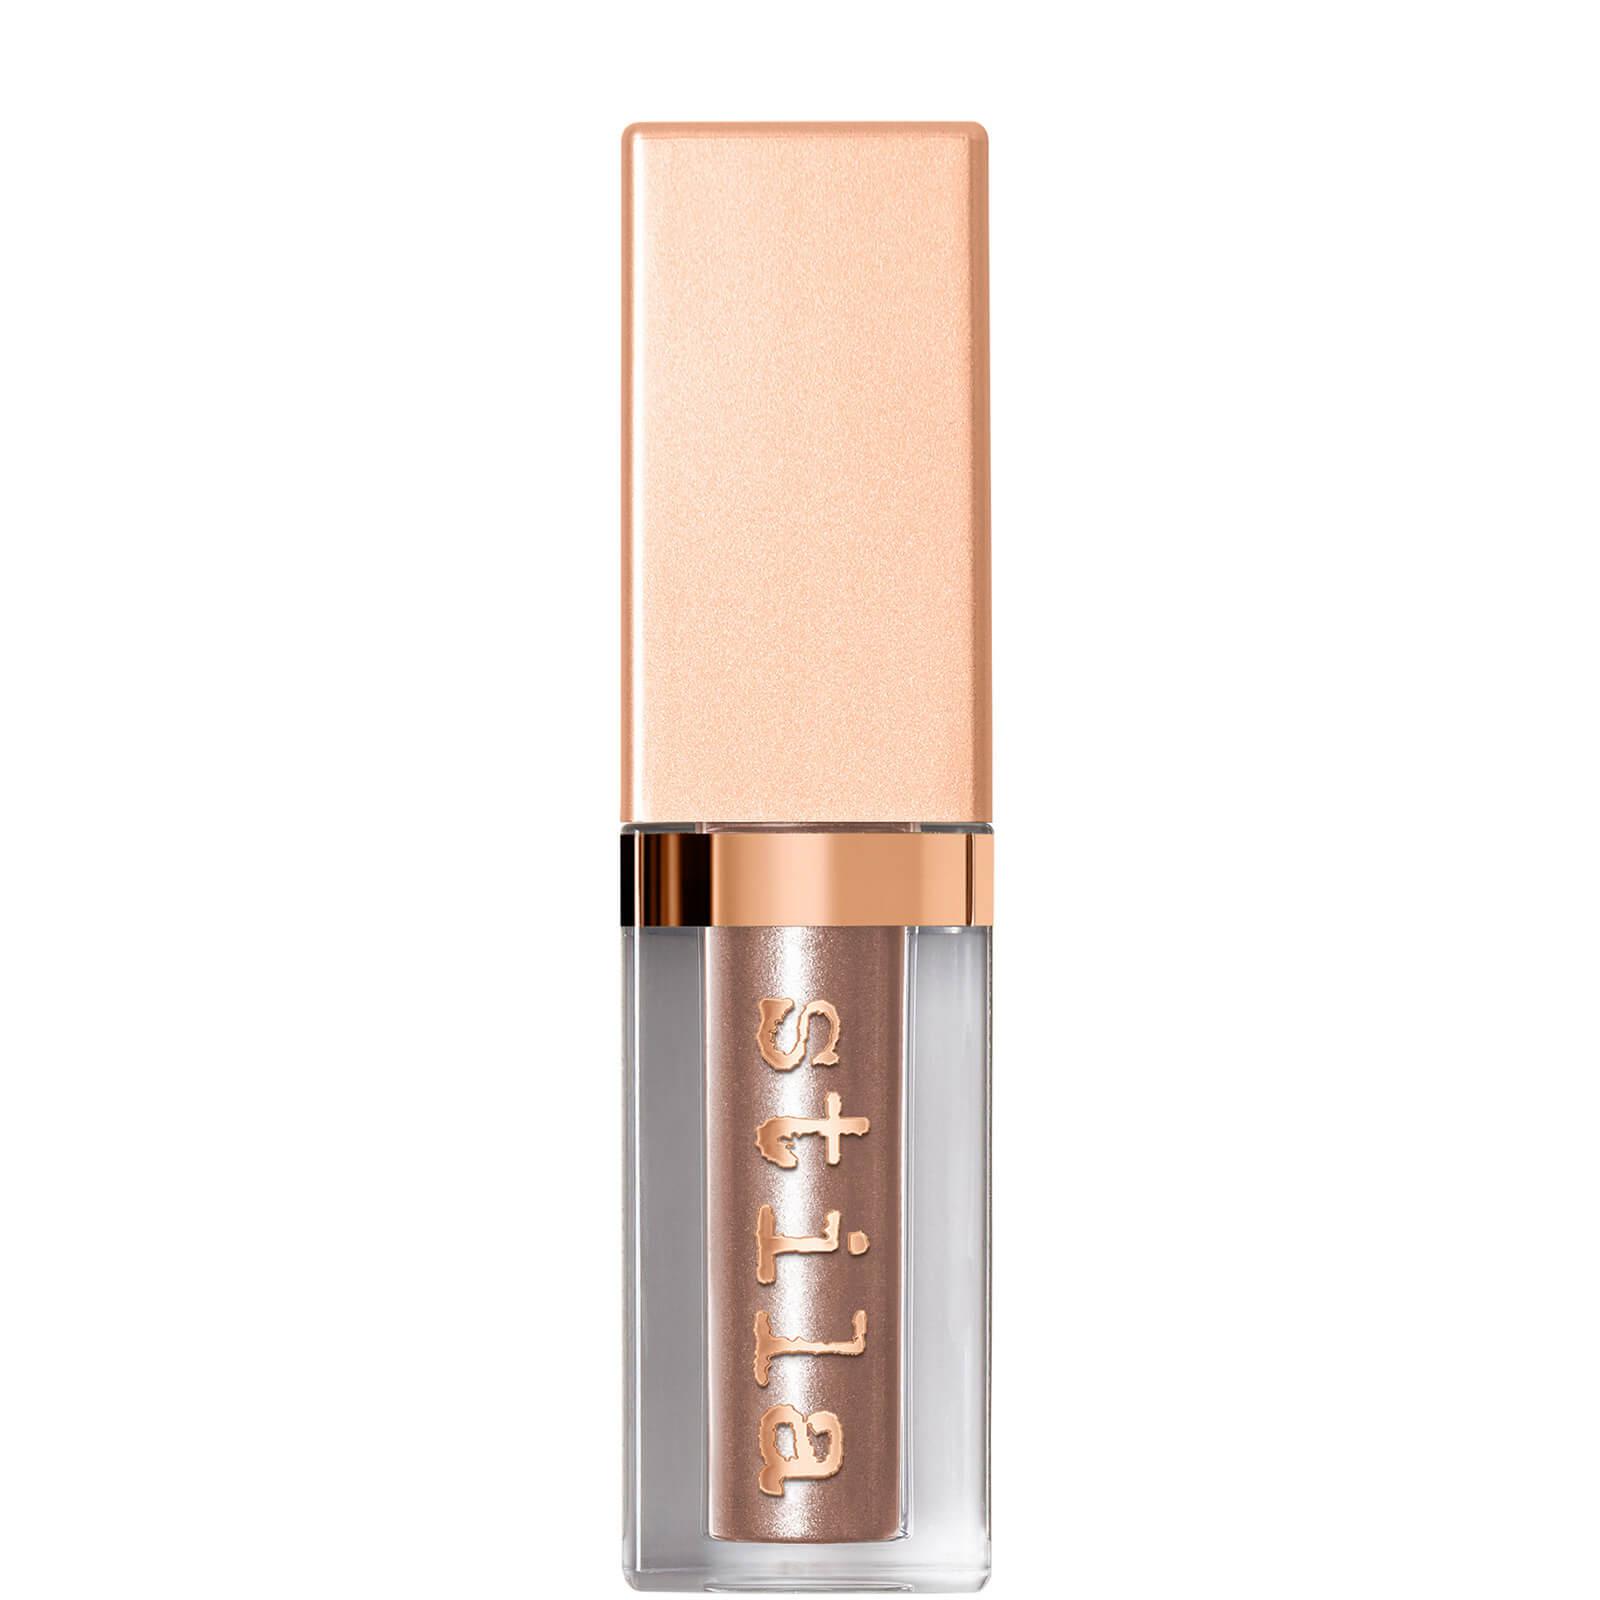 Купить Stila Shimmer & Glow Eyeshadow 4.5ml (Various Shades) - Grace